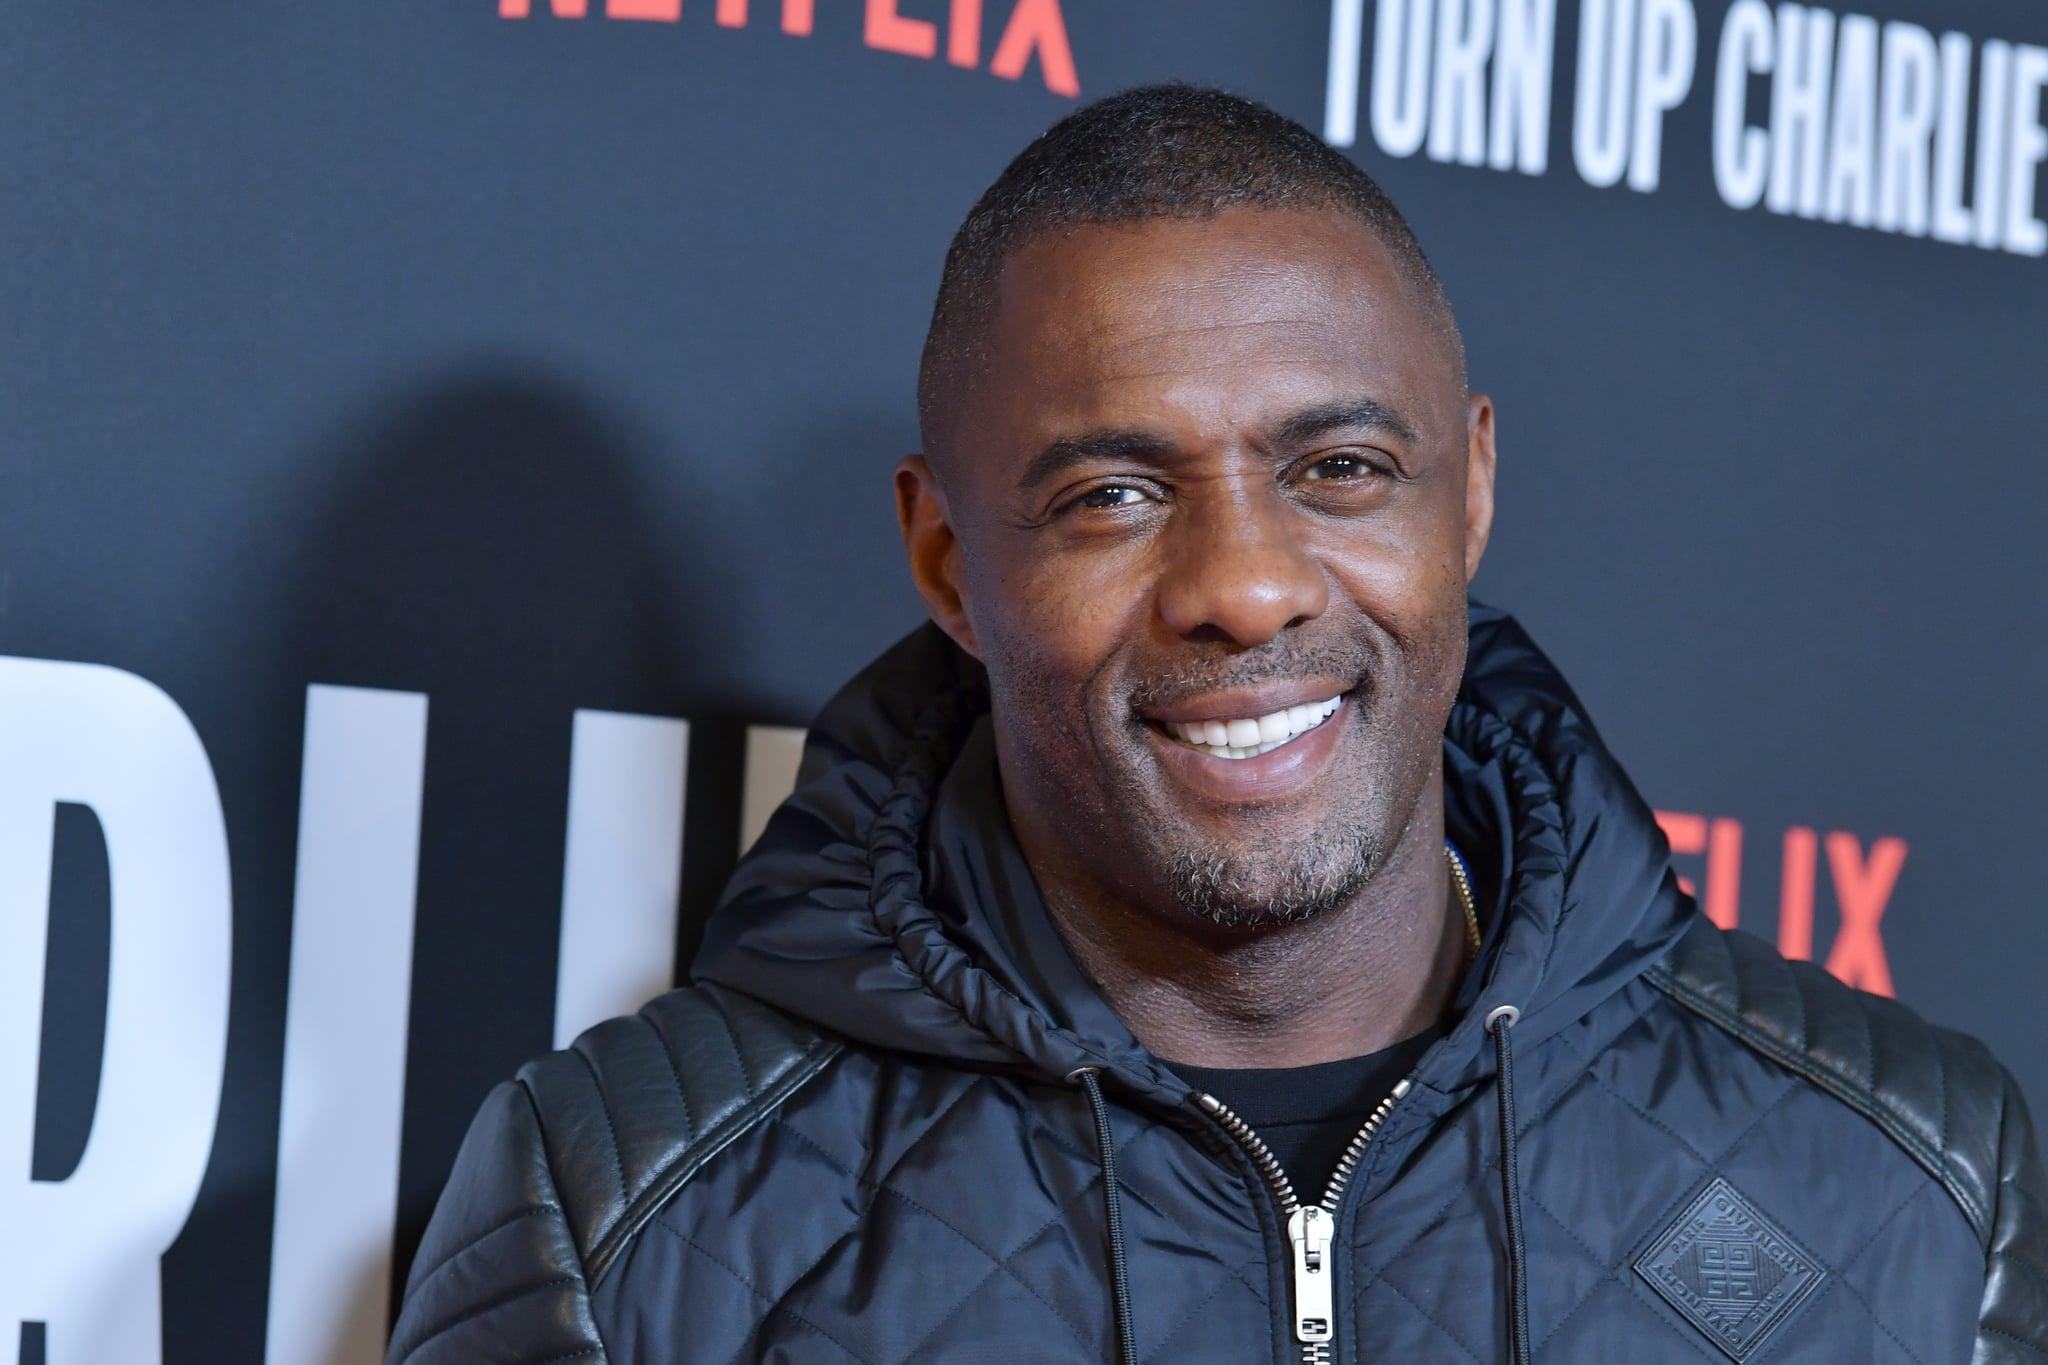 WEST HOLLYWOOD, CALIFORNIA - MARCH 02: Idris Elba attends Netflix's